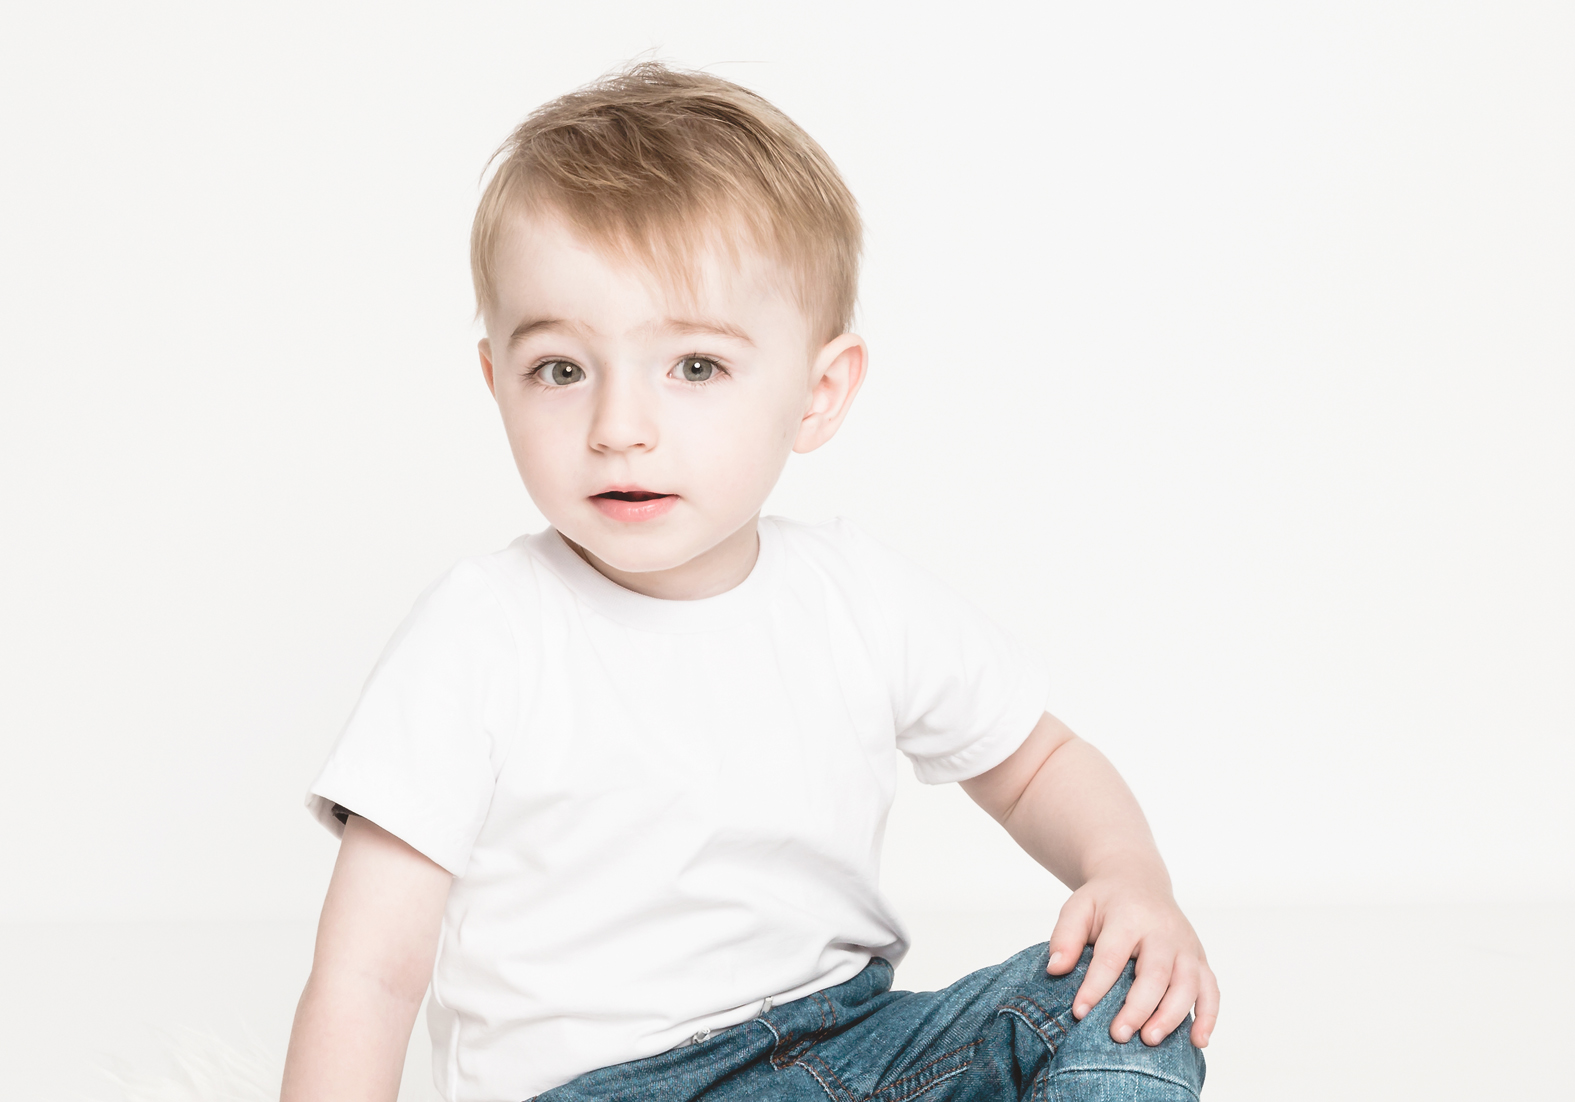 Kidsfotografie